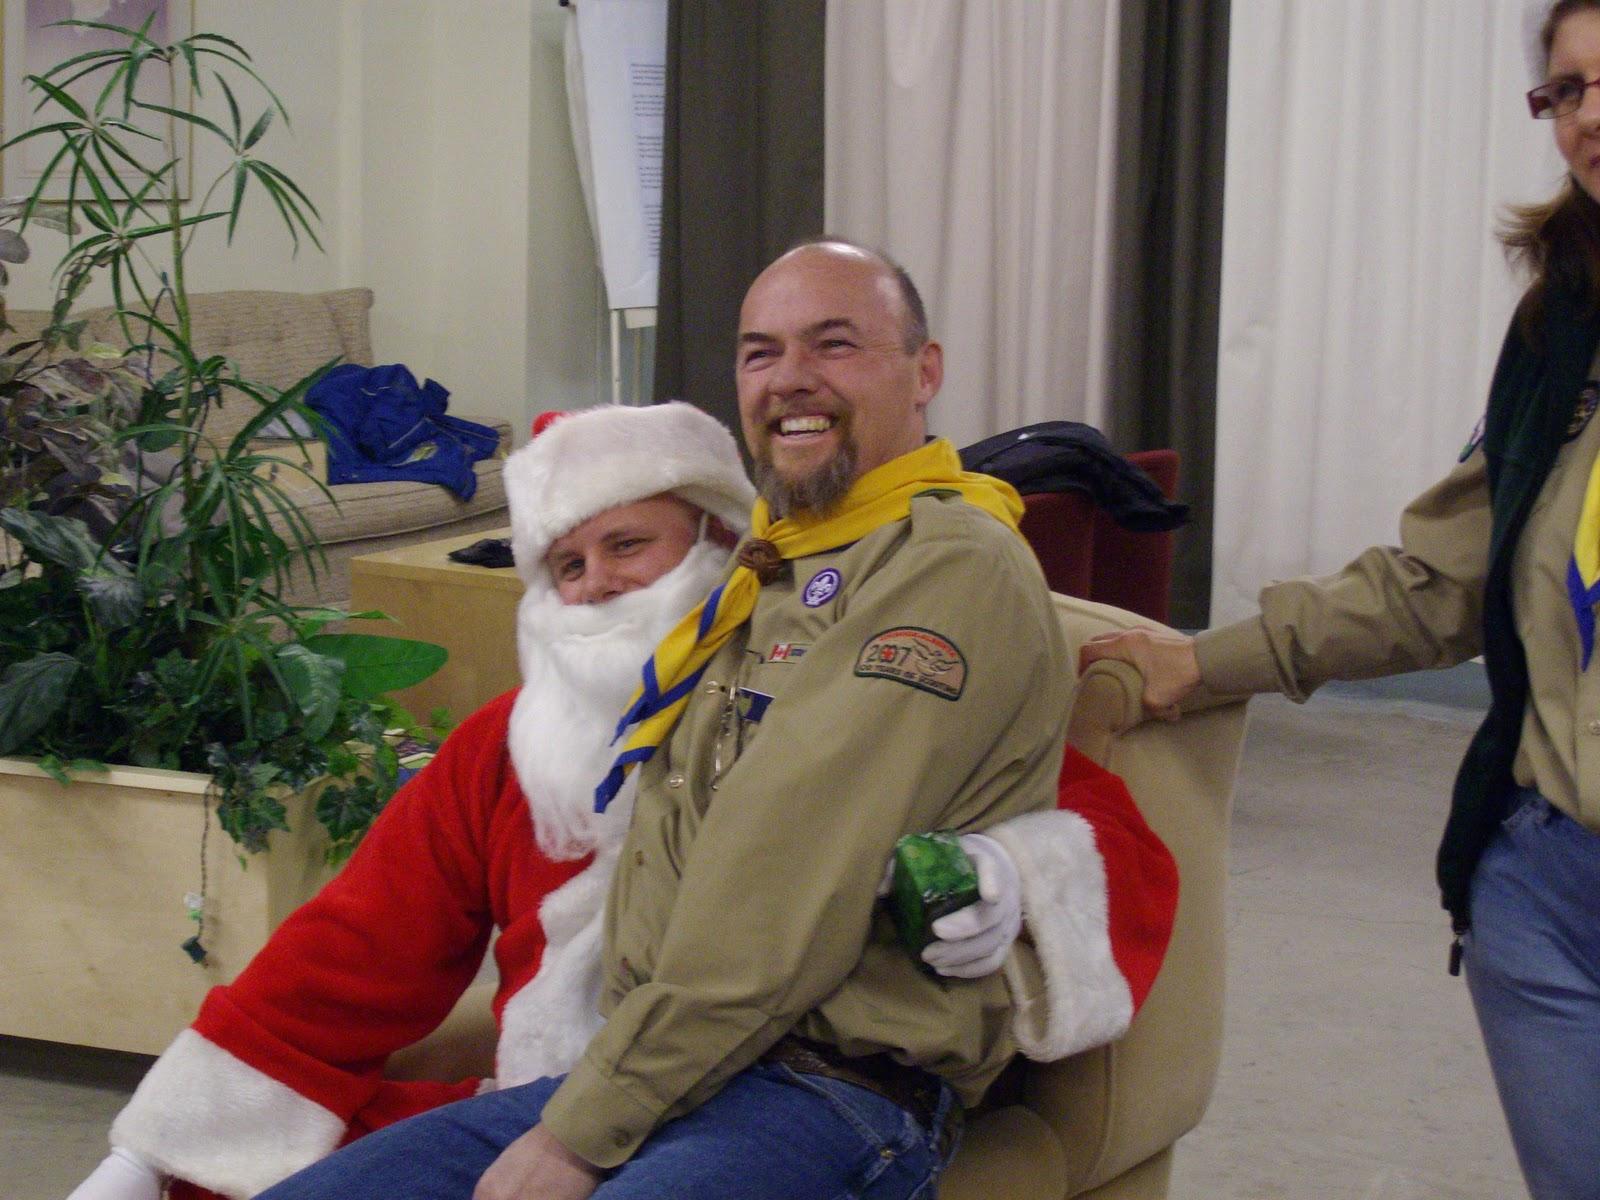 http://3.bp.blogspot.com/_Jrboft4dN4U/TRBL6ctKkzI/AAAAAAAAAMA/AMa9jDo0ffc/s1600/cubs+christmas+030.JPG